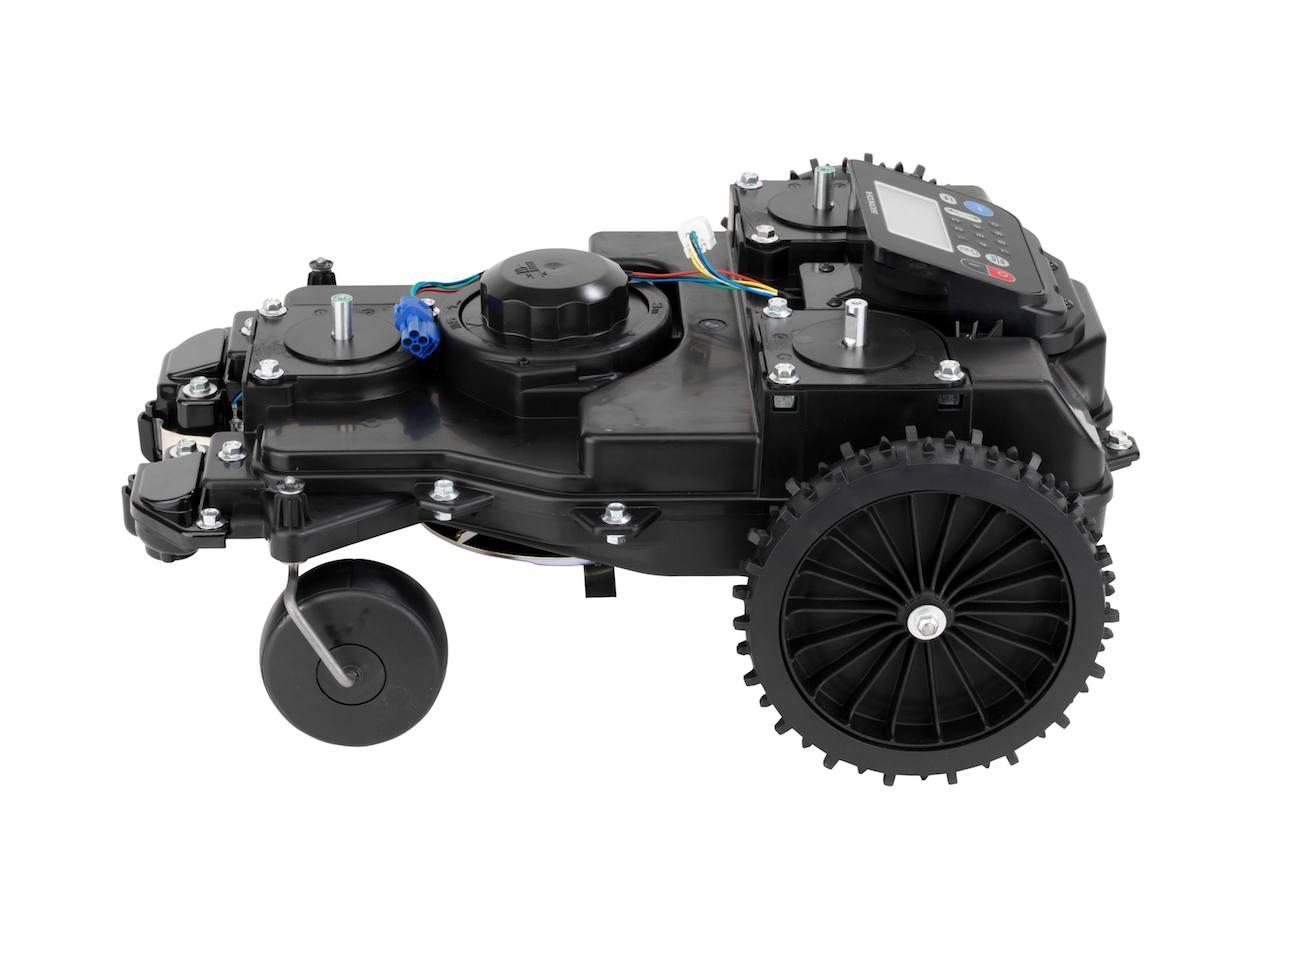 Miimo Robotic Lawn Mower 187 Gadget Flow